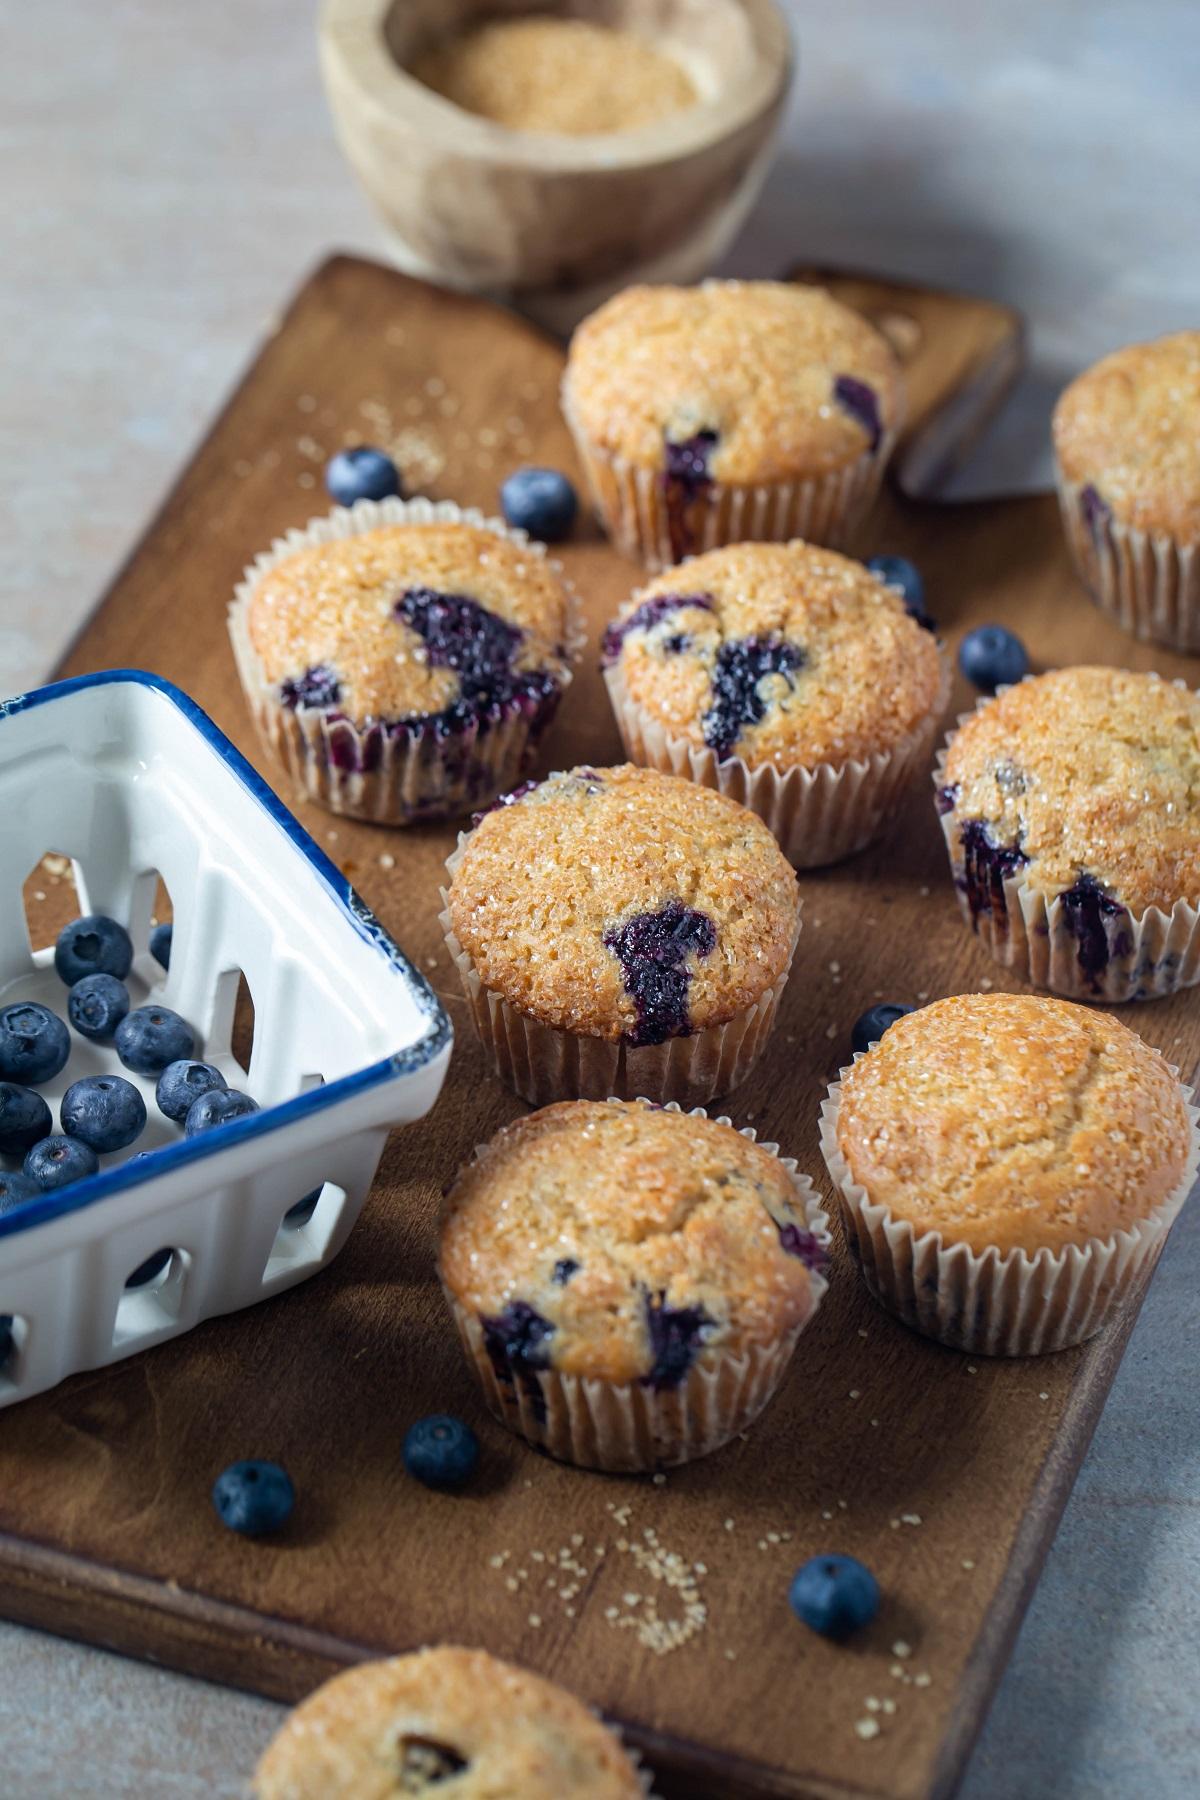 several vegan blueberry muffins on wood platter